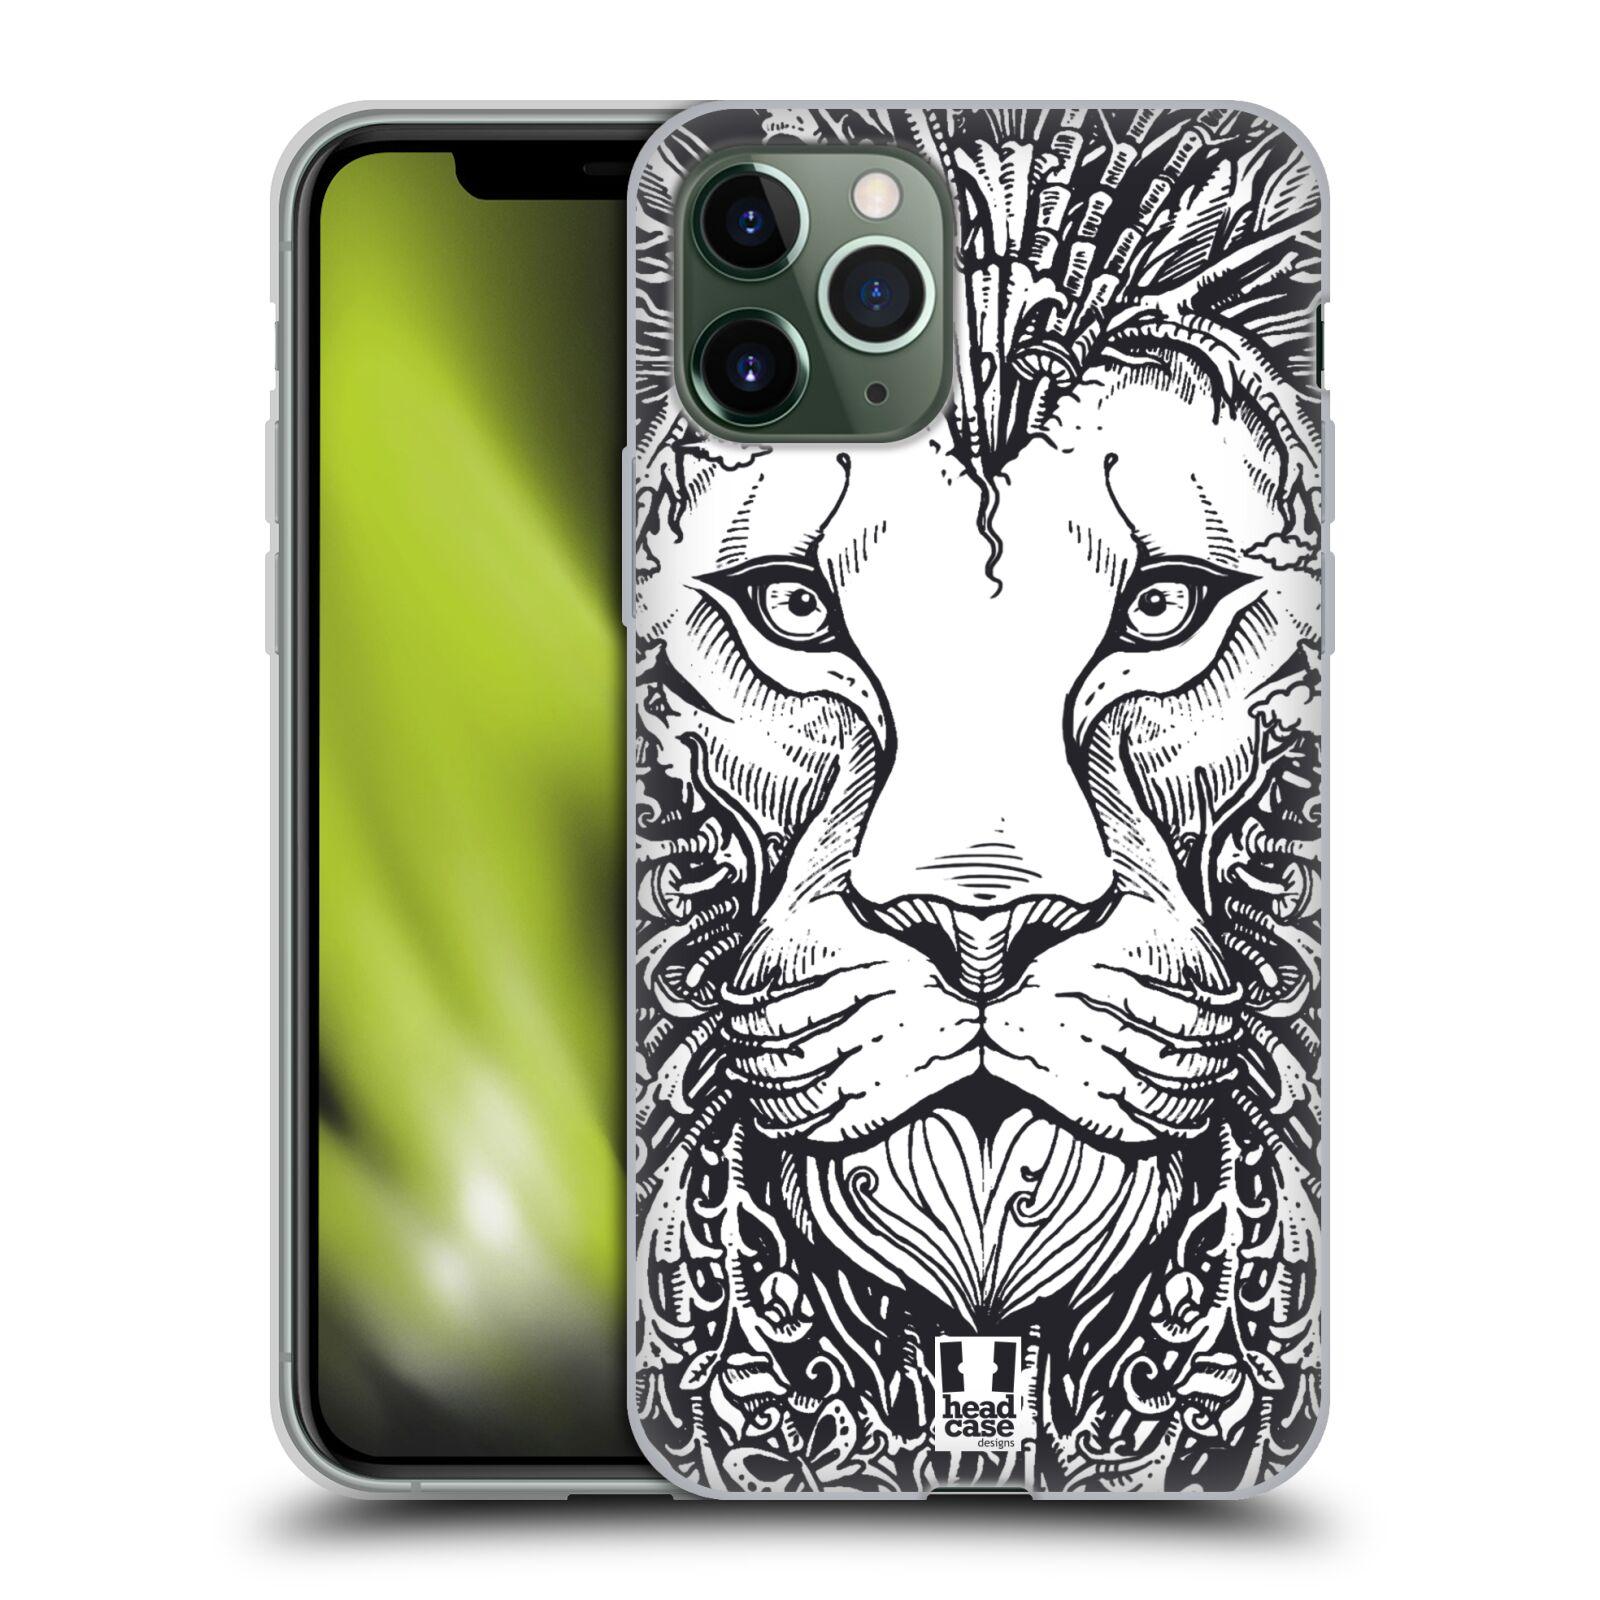 louisvuitton krytu na iphone xr | Silikonové pouzdro na mobil Apple iPhone 11 Pro - Head Case - DOODLE TVÁŘ LEV